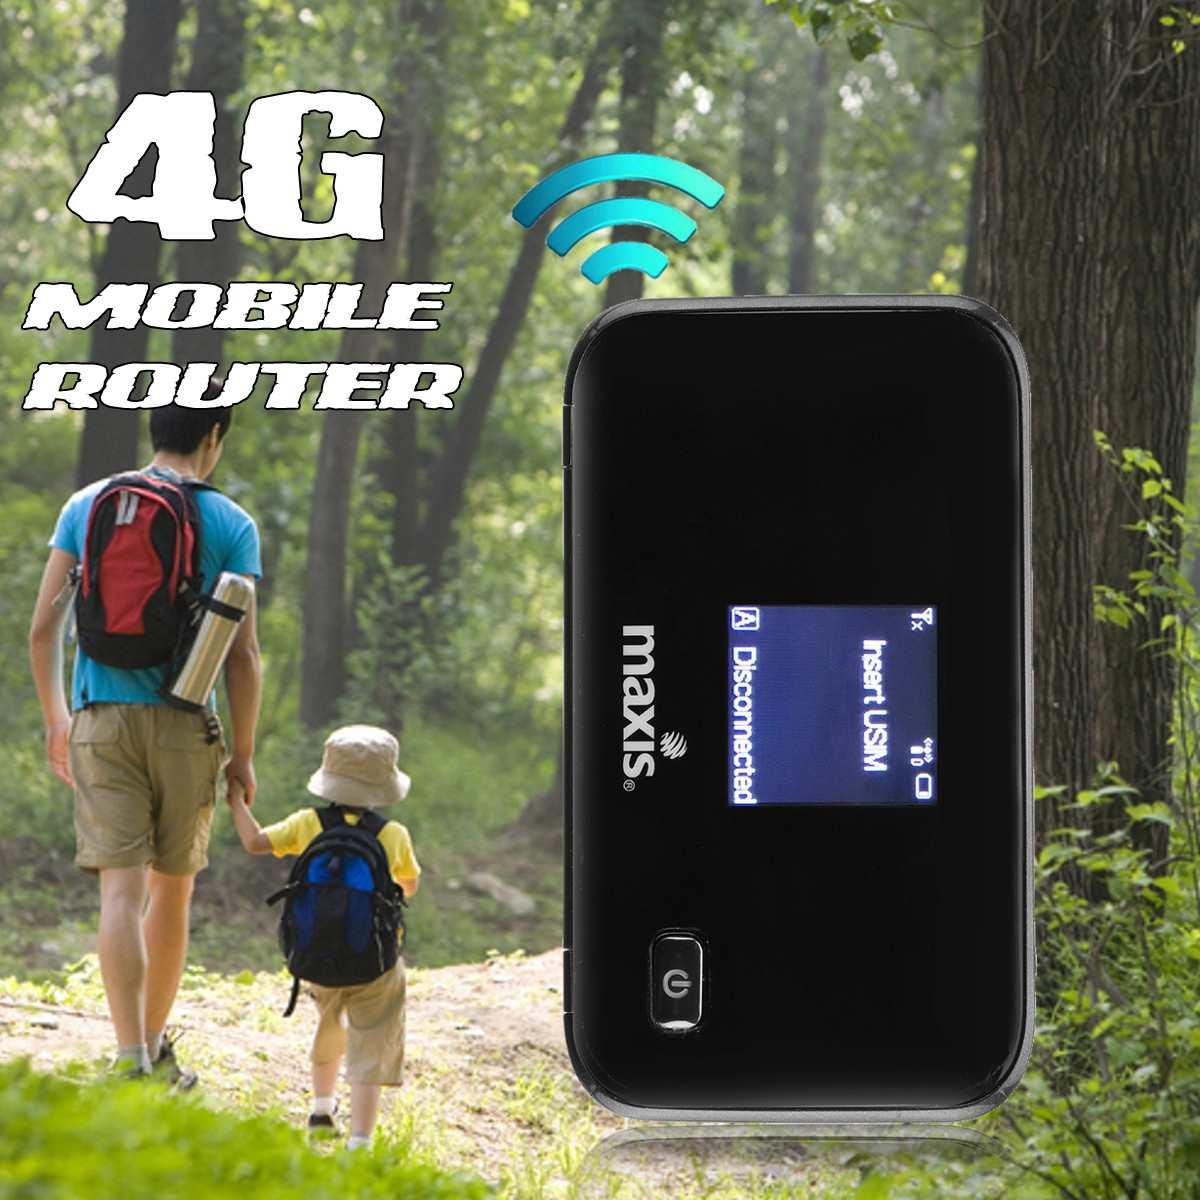 4g/3g Lte Fdd Wifi B1/b3 Wireless Mobile Hotspot Router Modem 150 Mbps Entsperrt- Networking